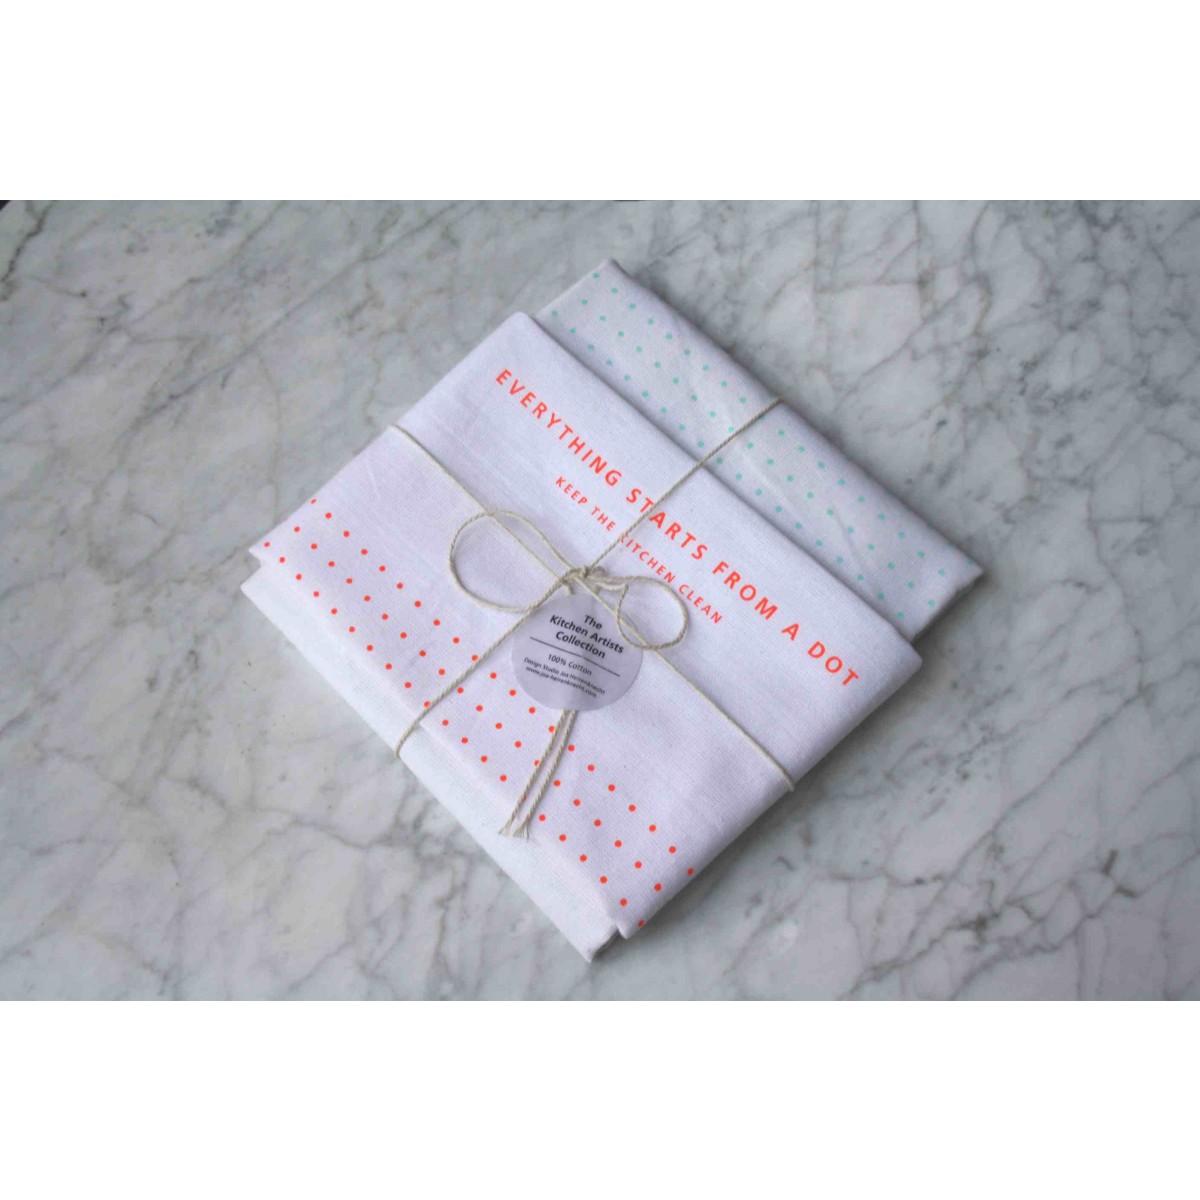 Studio Joa Herrenknecht Tea Towel Set - Everything starts from a dot.